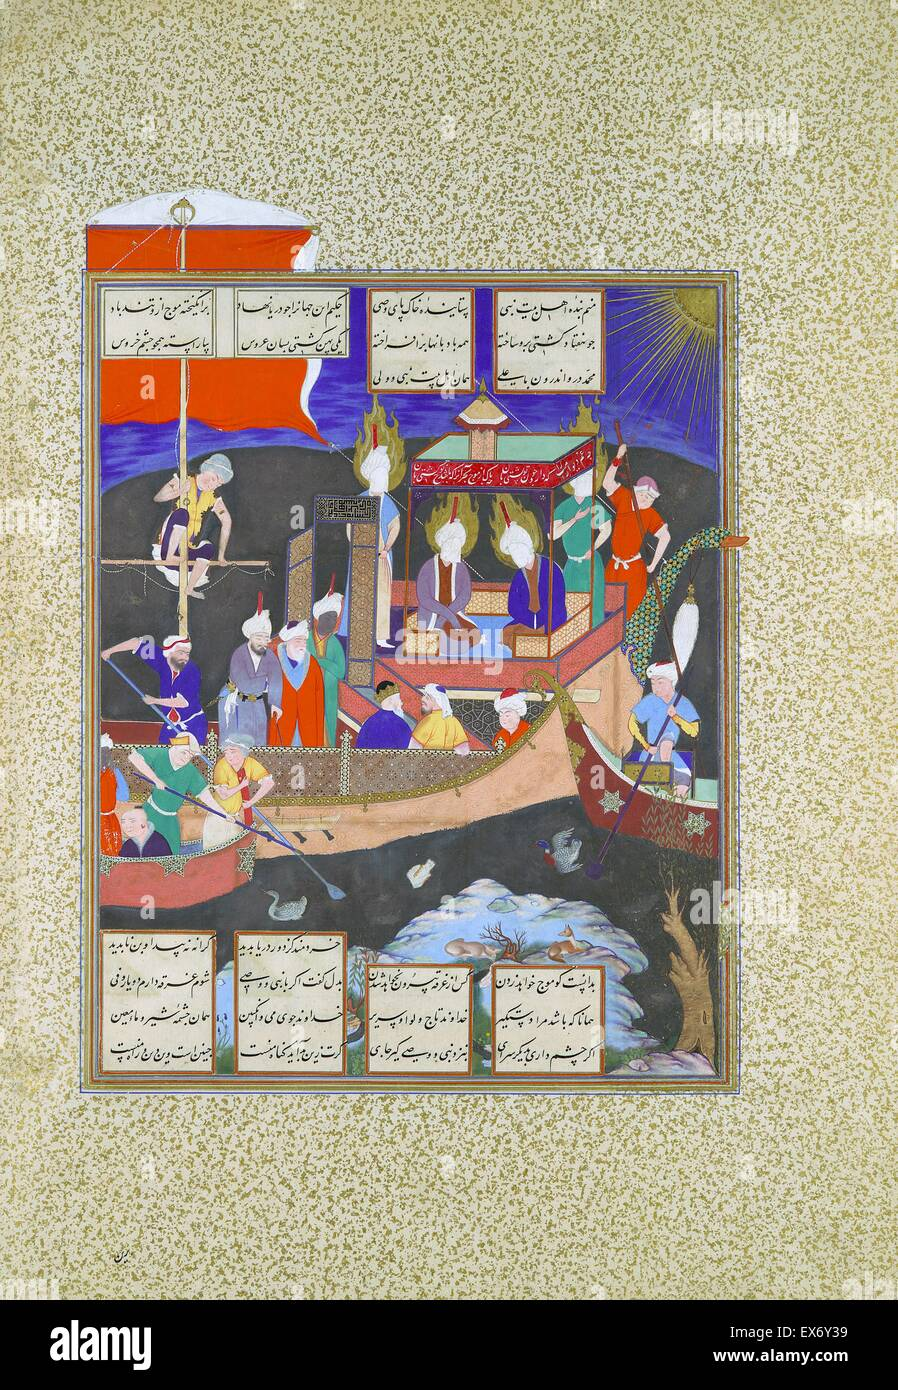 Firdausi's Parable of the Ship of Faith, produced for Shah Tahmasp I. Author Miza Ali. 1535 - Stock Image